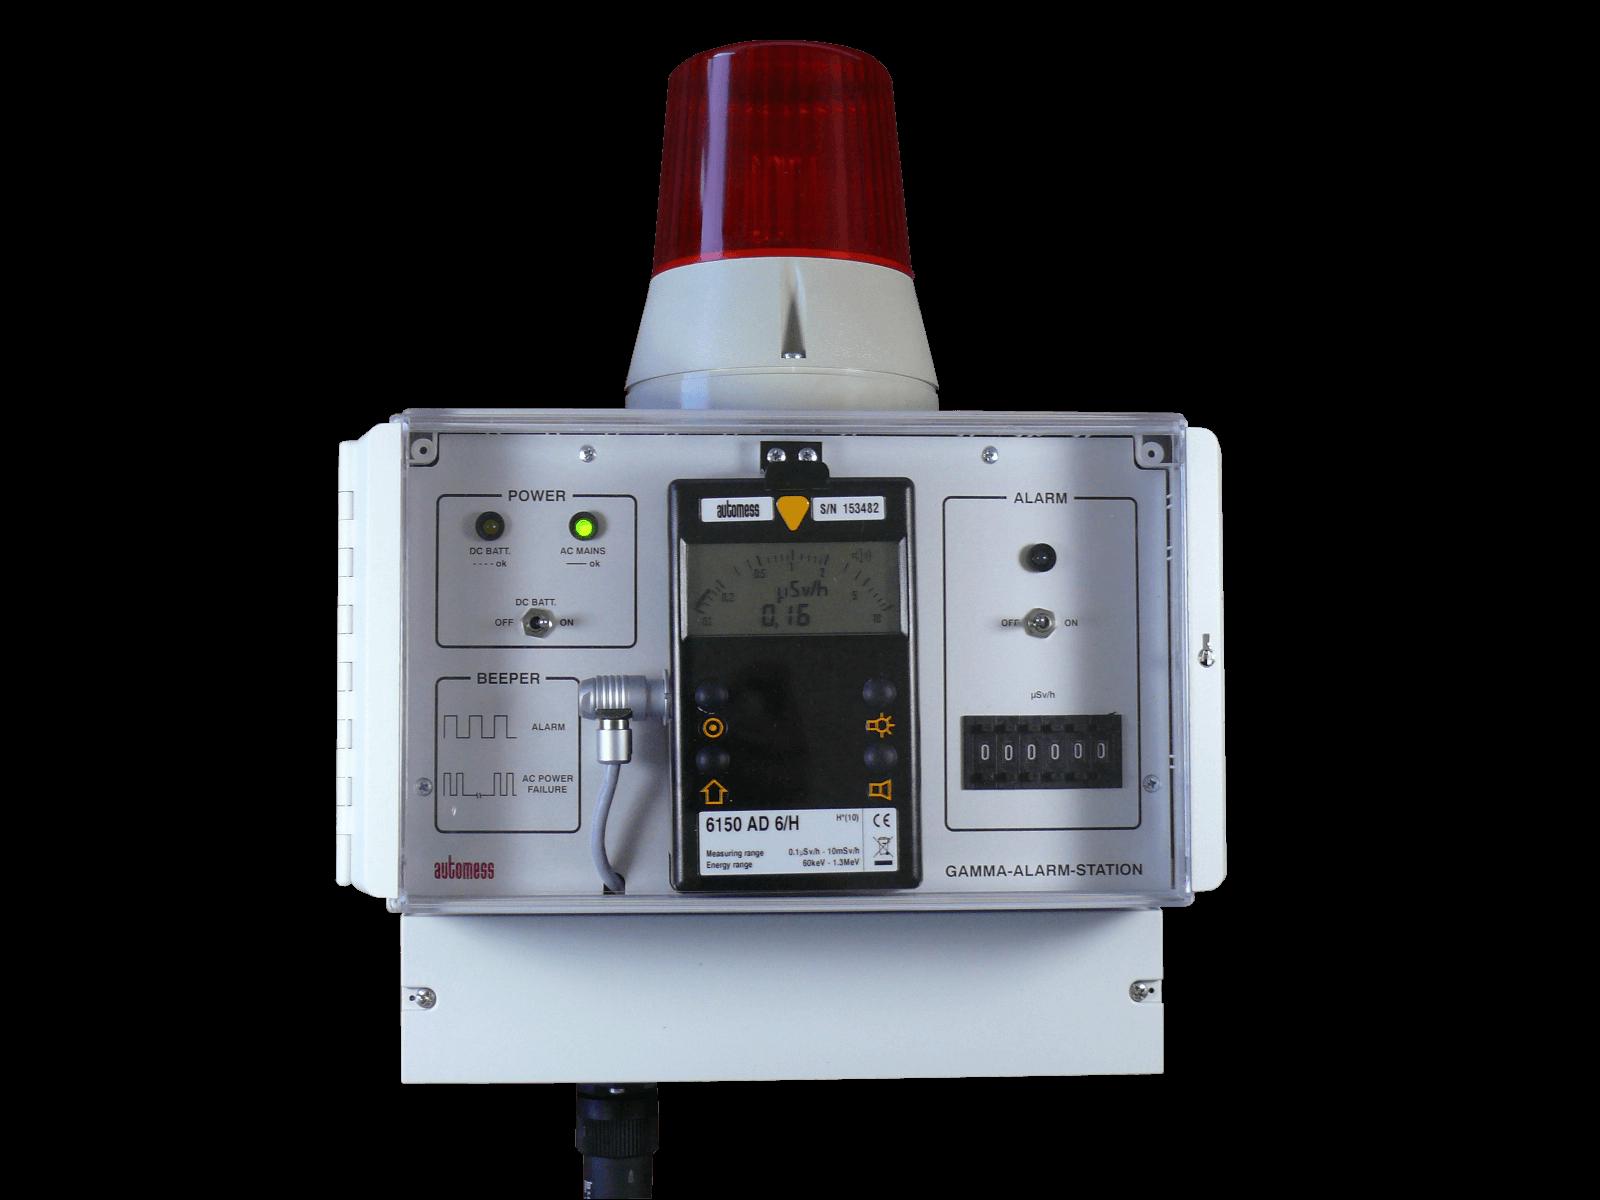 Gamma-Alarm-Station 859.1